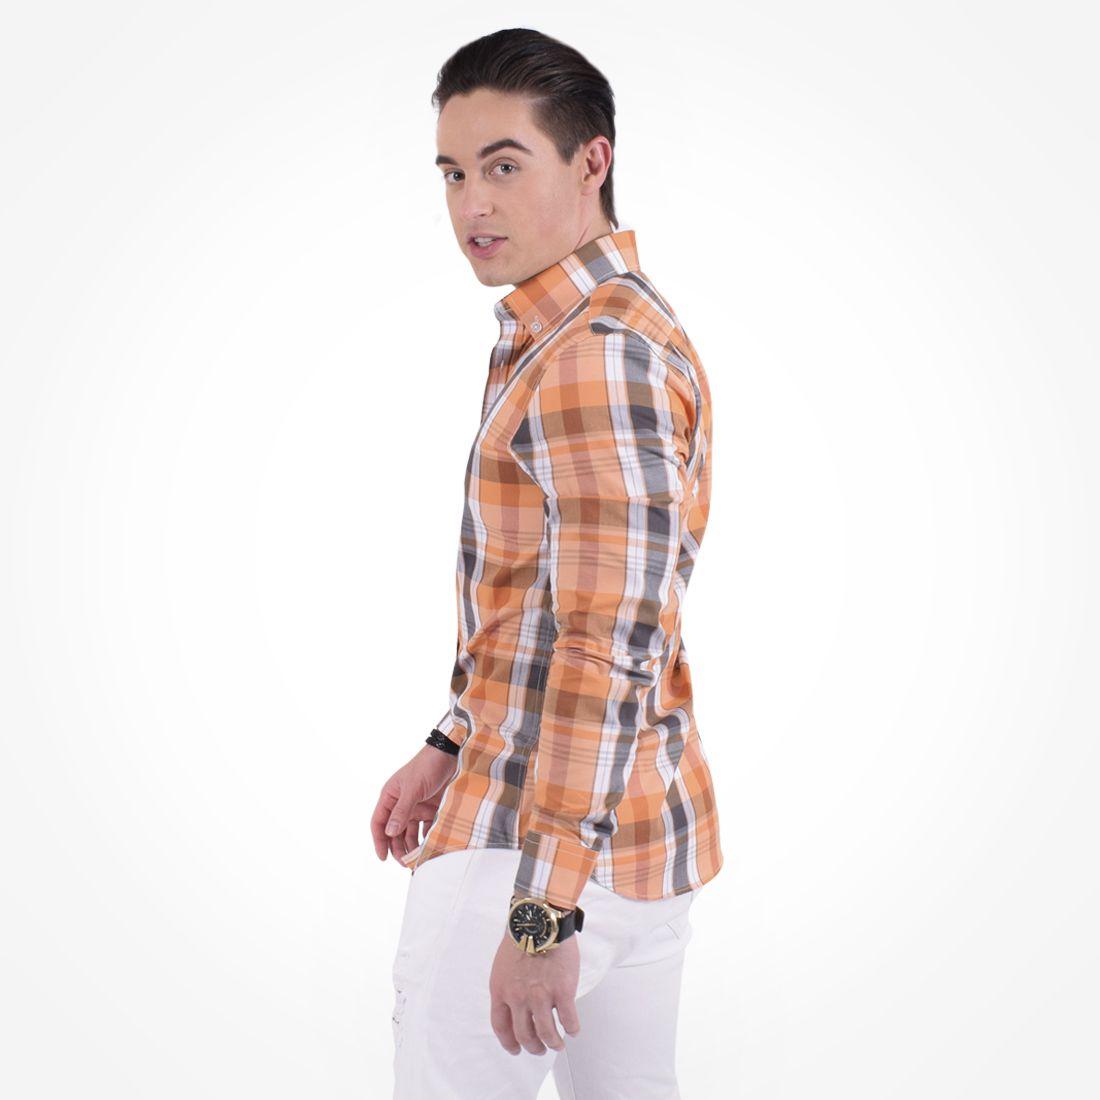 100232 - Camisa Xadrez Masculina Slim Social Estampada Laranja - LEVOK